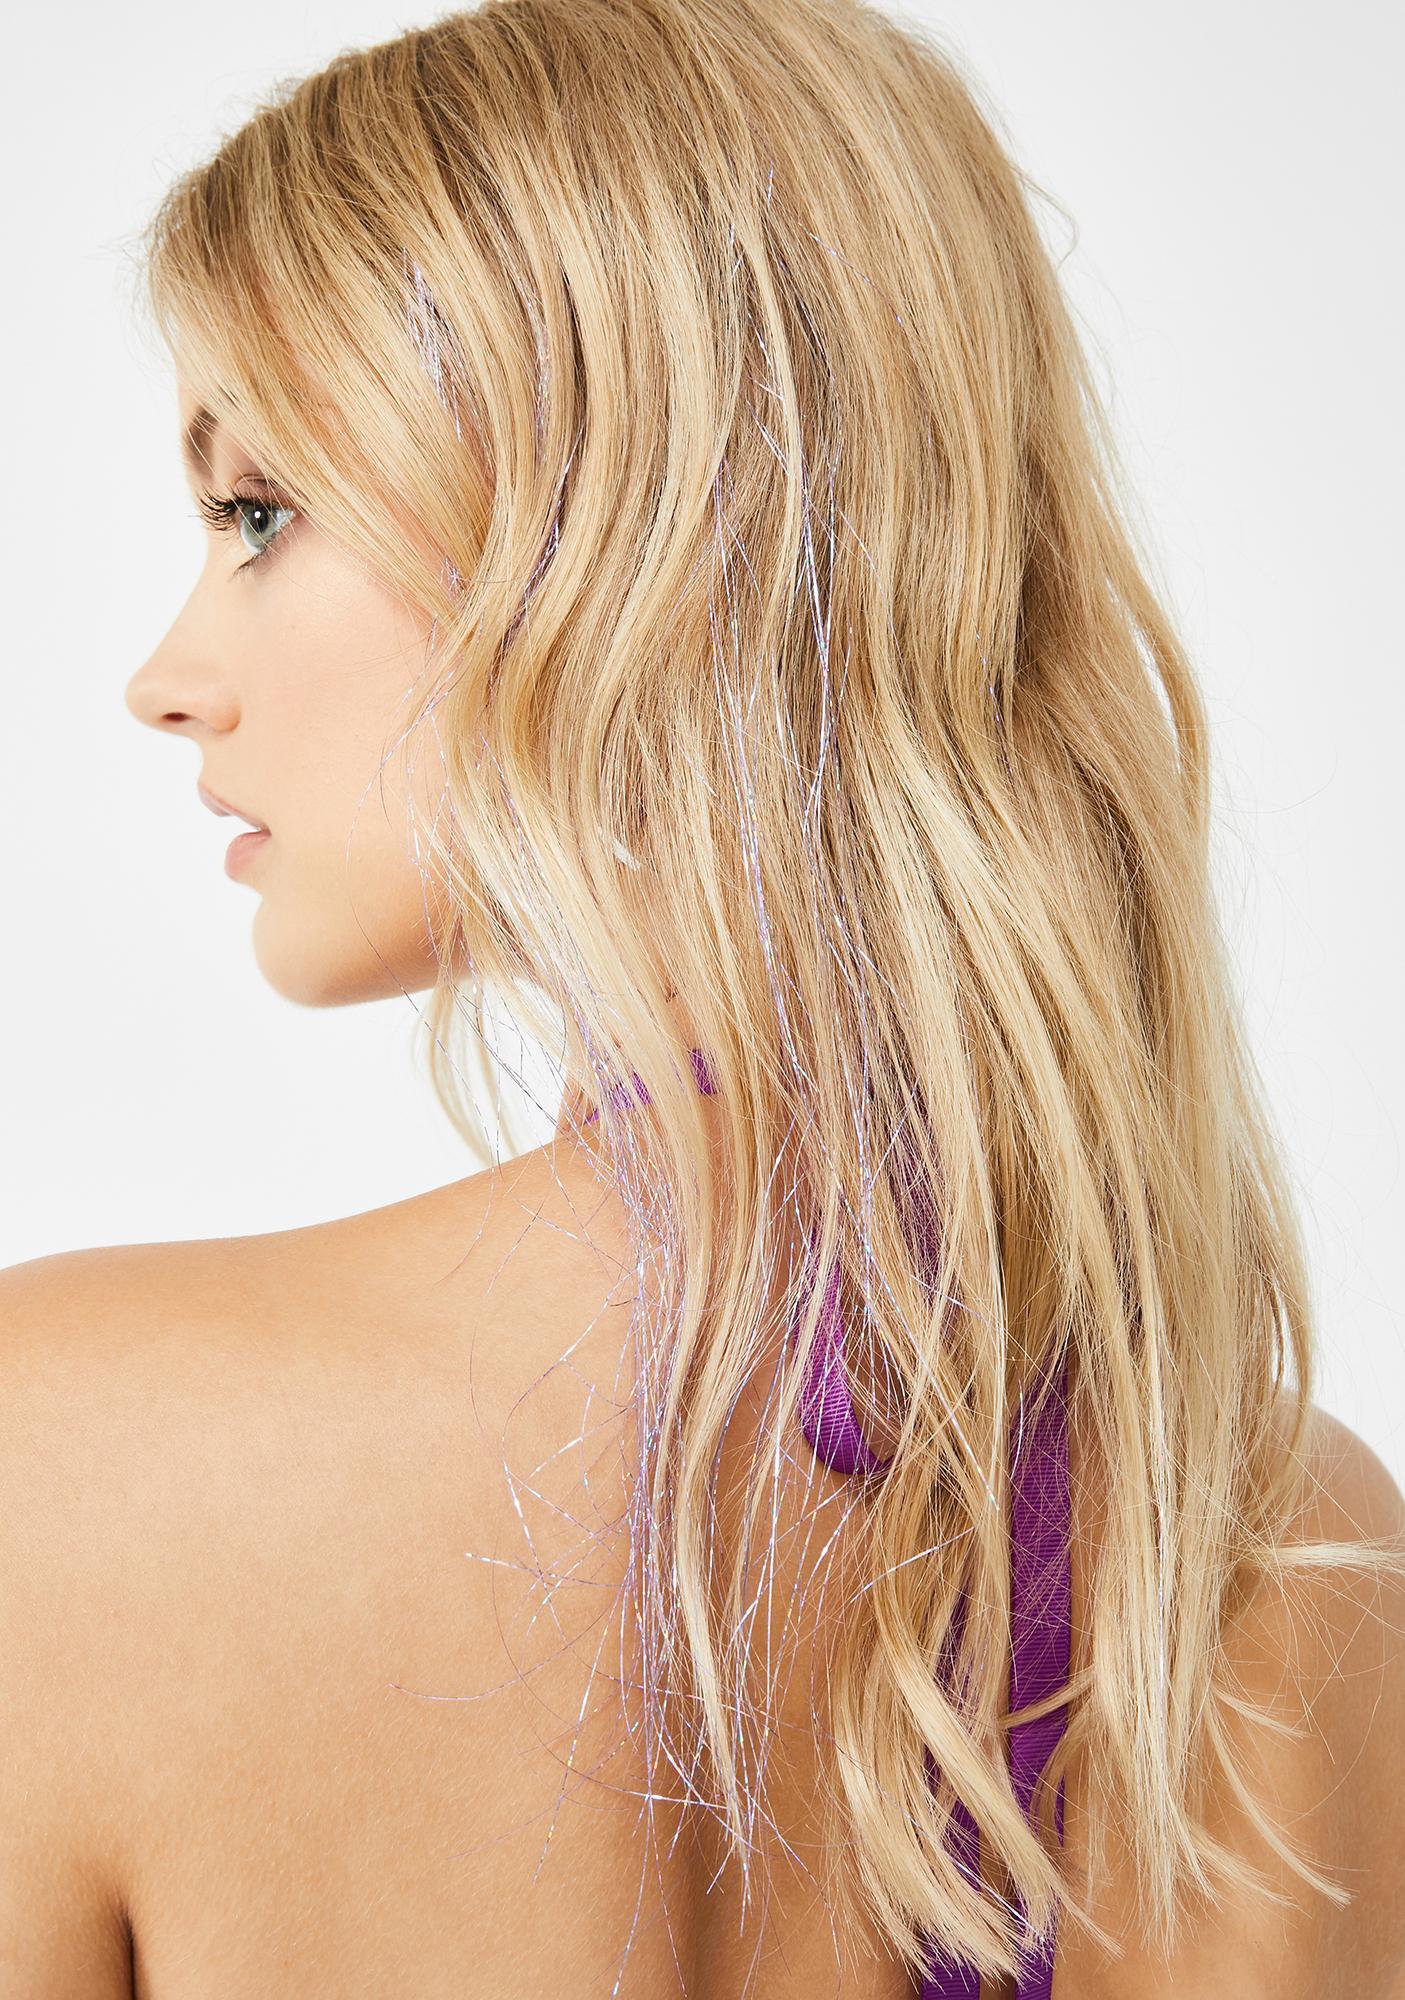 Iris Glitter Hair Strands by Goddess Glitter